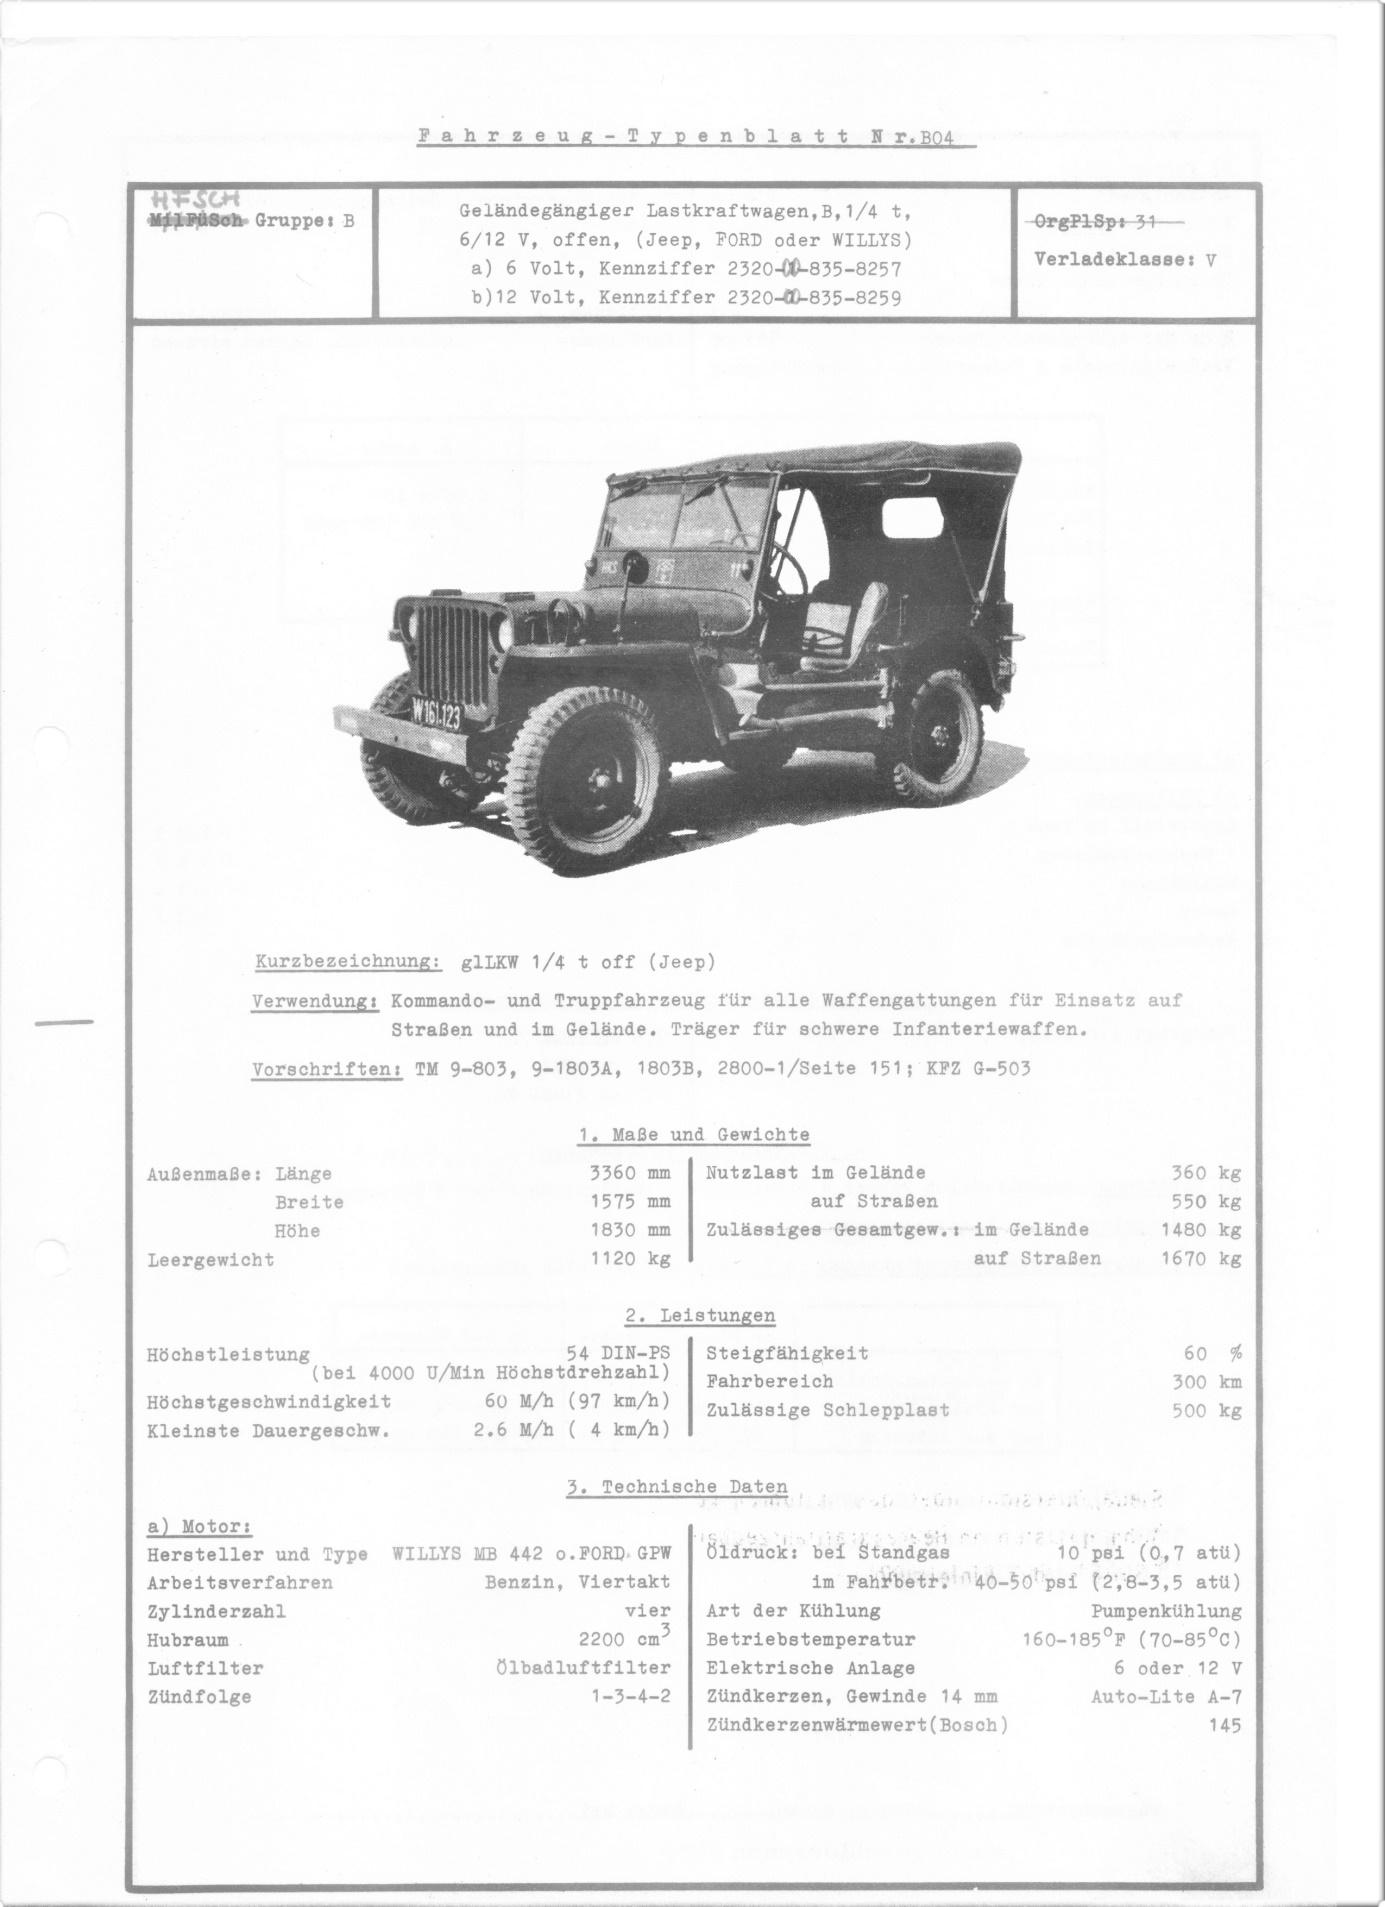 D:\Archiv Nemeth\Fzg-Gerät-Ausrüstung\Fahrzeuge\Mehrspurige Kfz\BH Fahrzeuge\Jeep\B04 a.jpeg